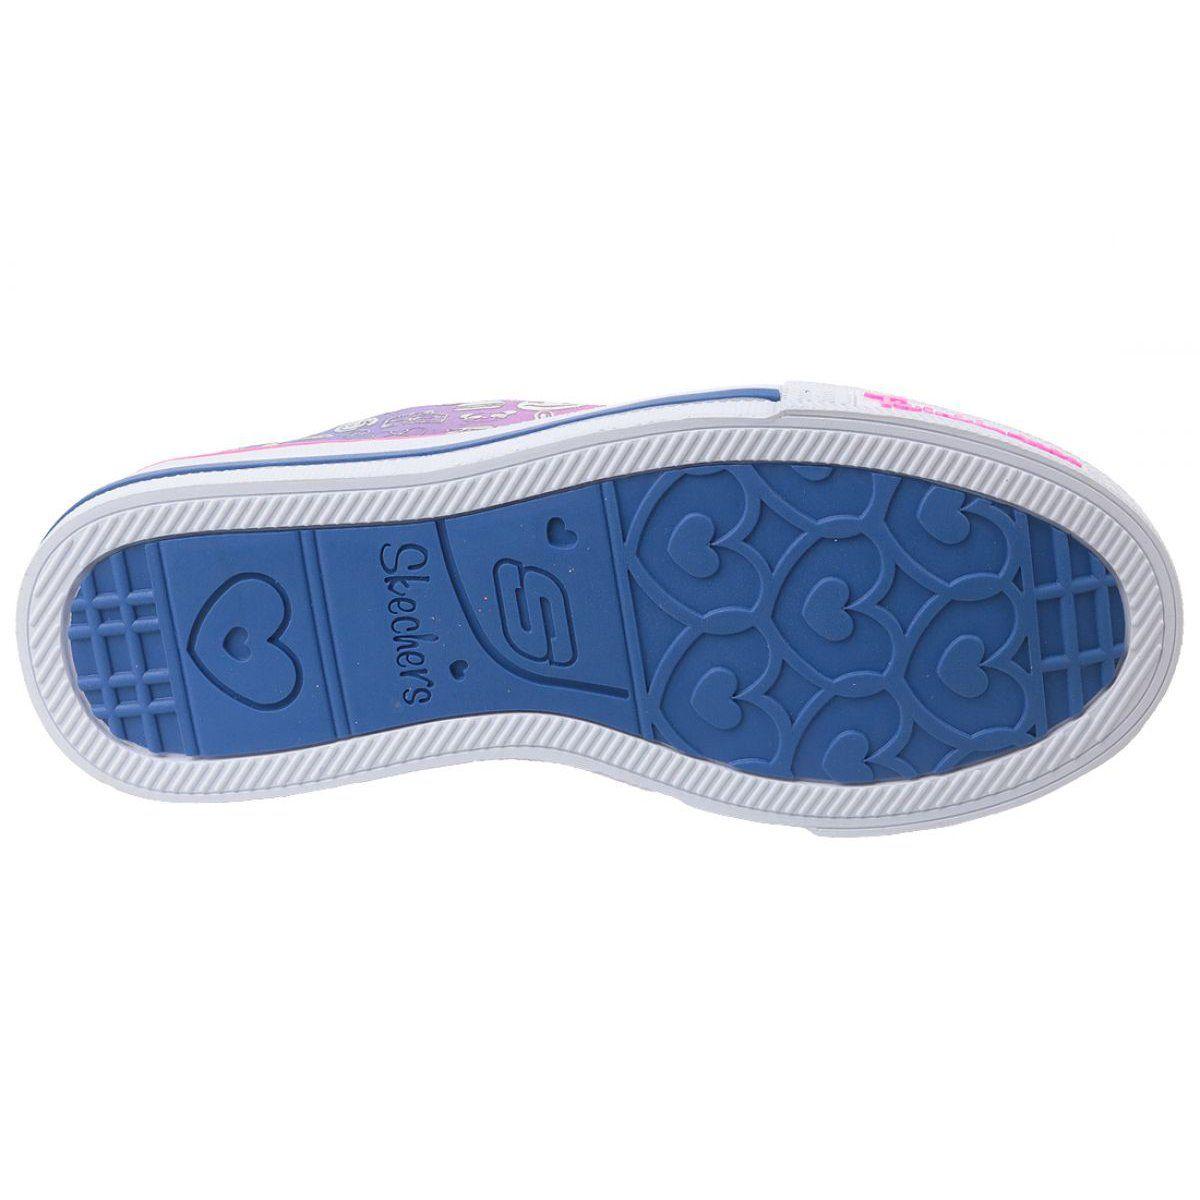 Buty Skechers Step Up Jr 10704l Blnp Wielokolorowe Skechers Childrens Shoes Kid Shoes